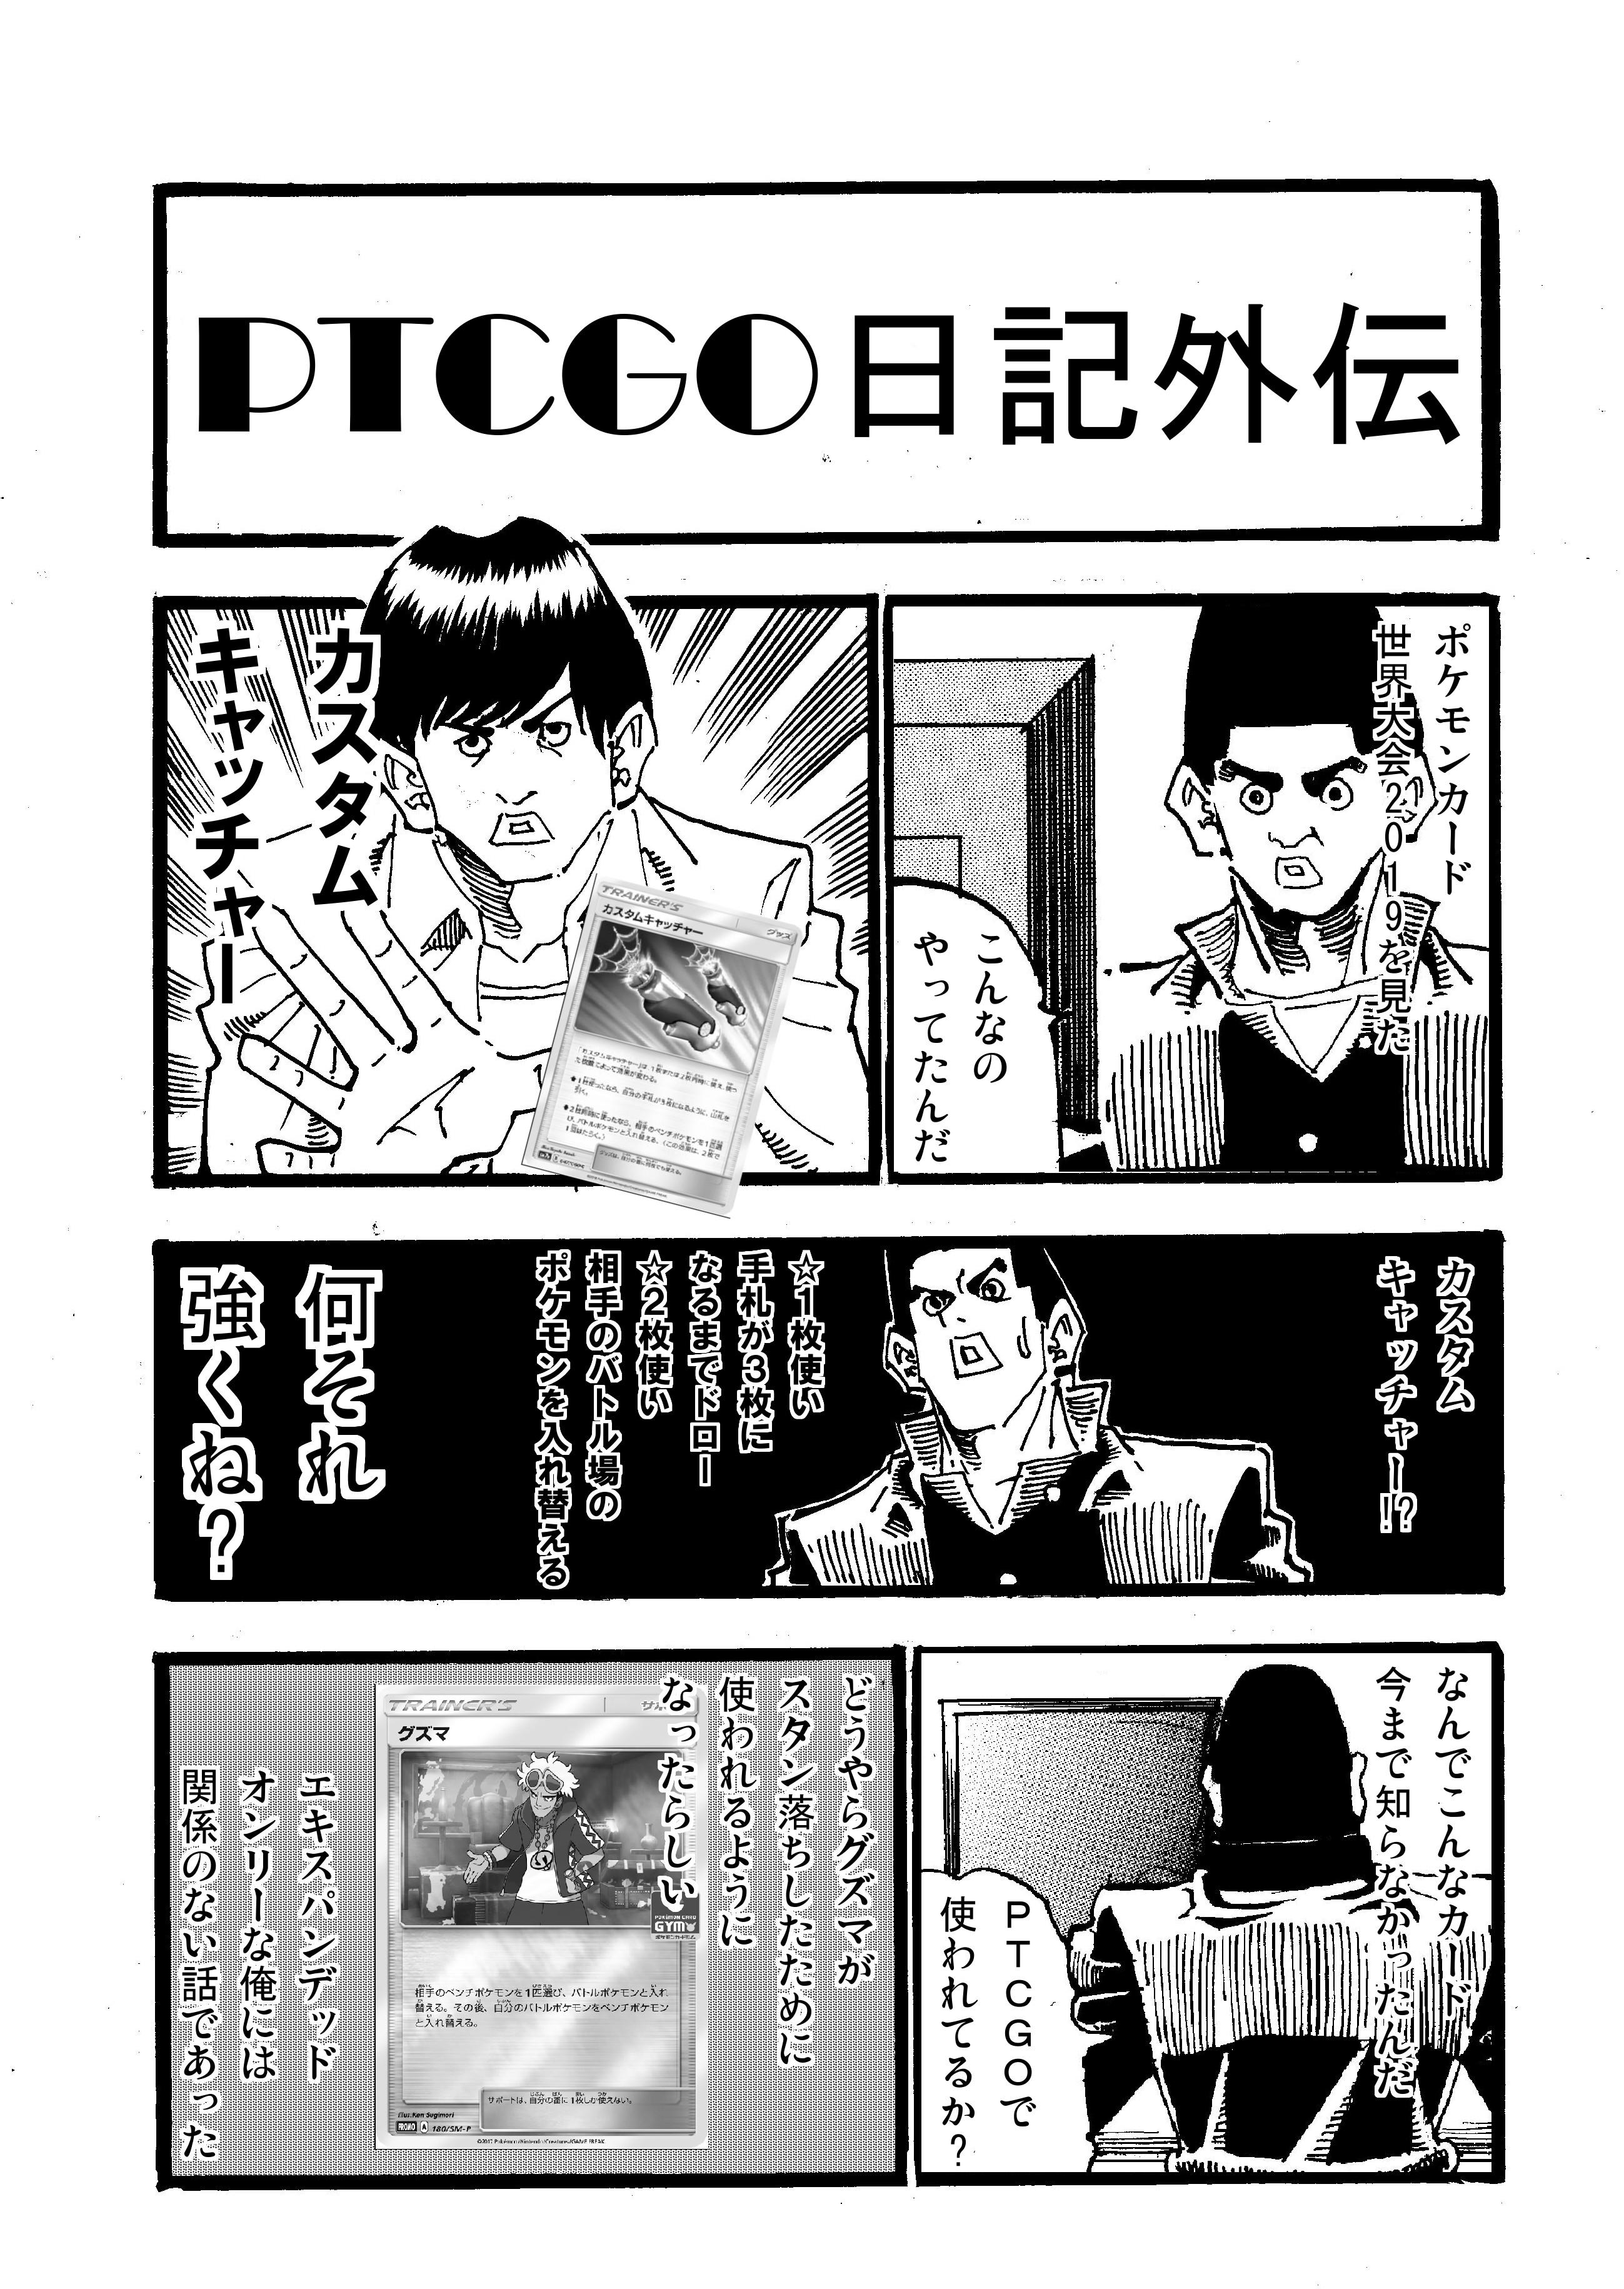 PTCGO日記外伝2 カスタムキャッチャー